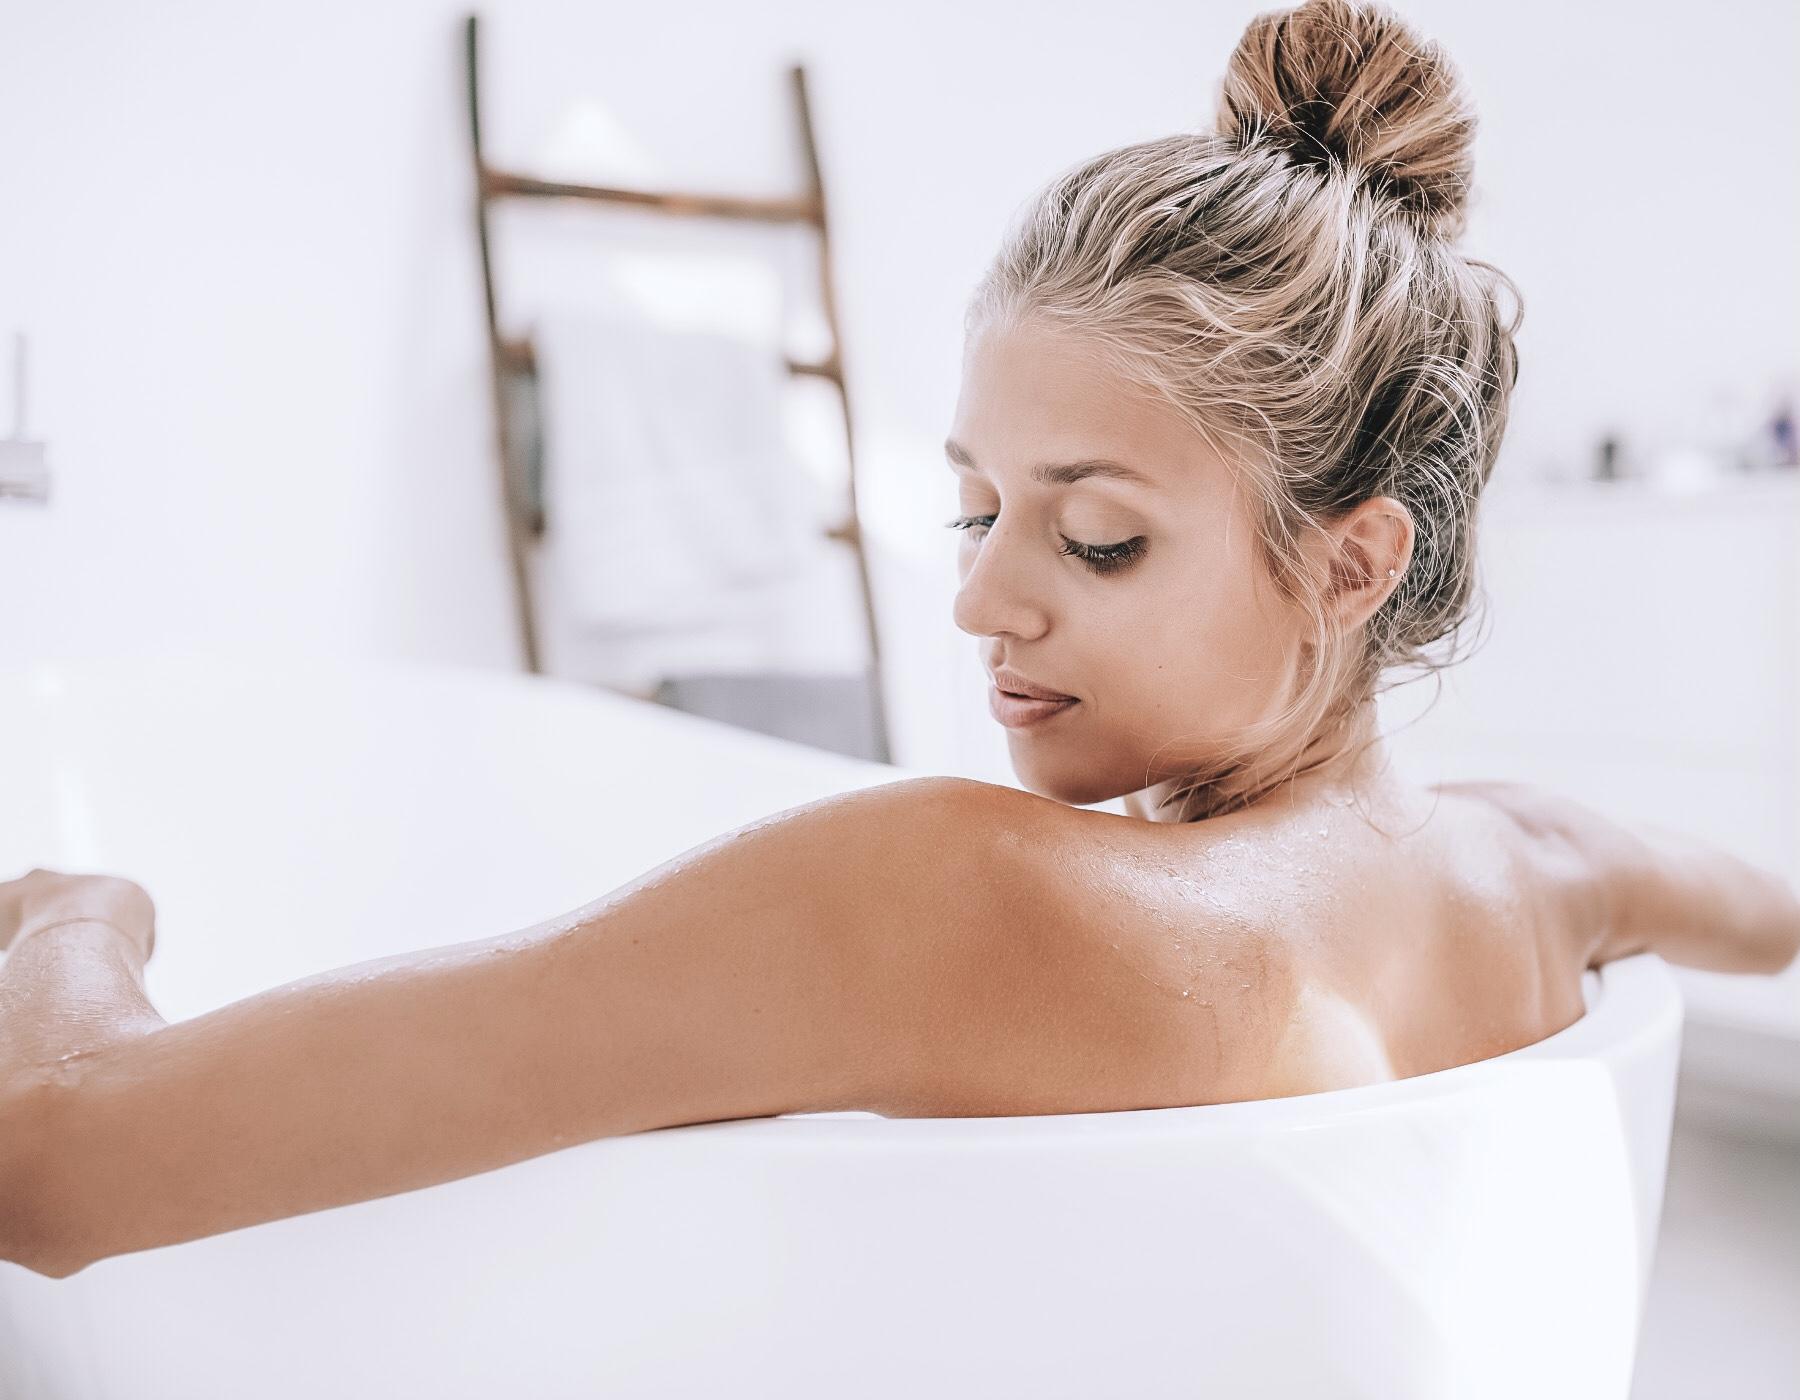 Beauty Self Care During Coronavirus